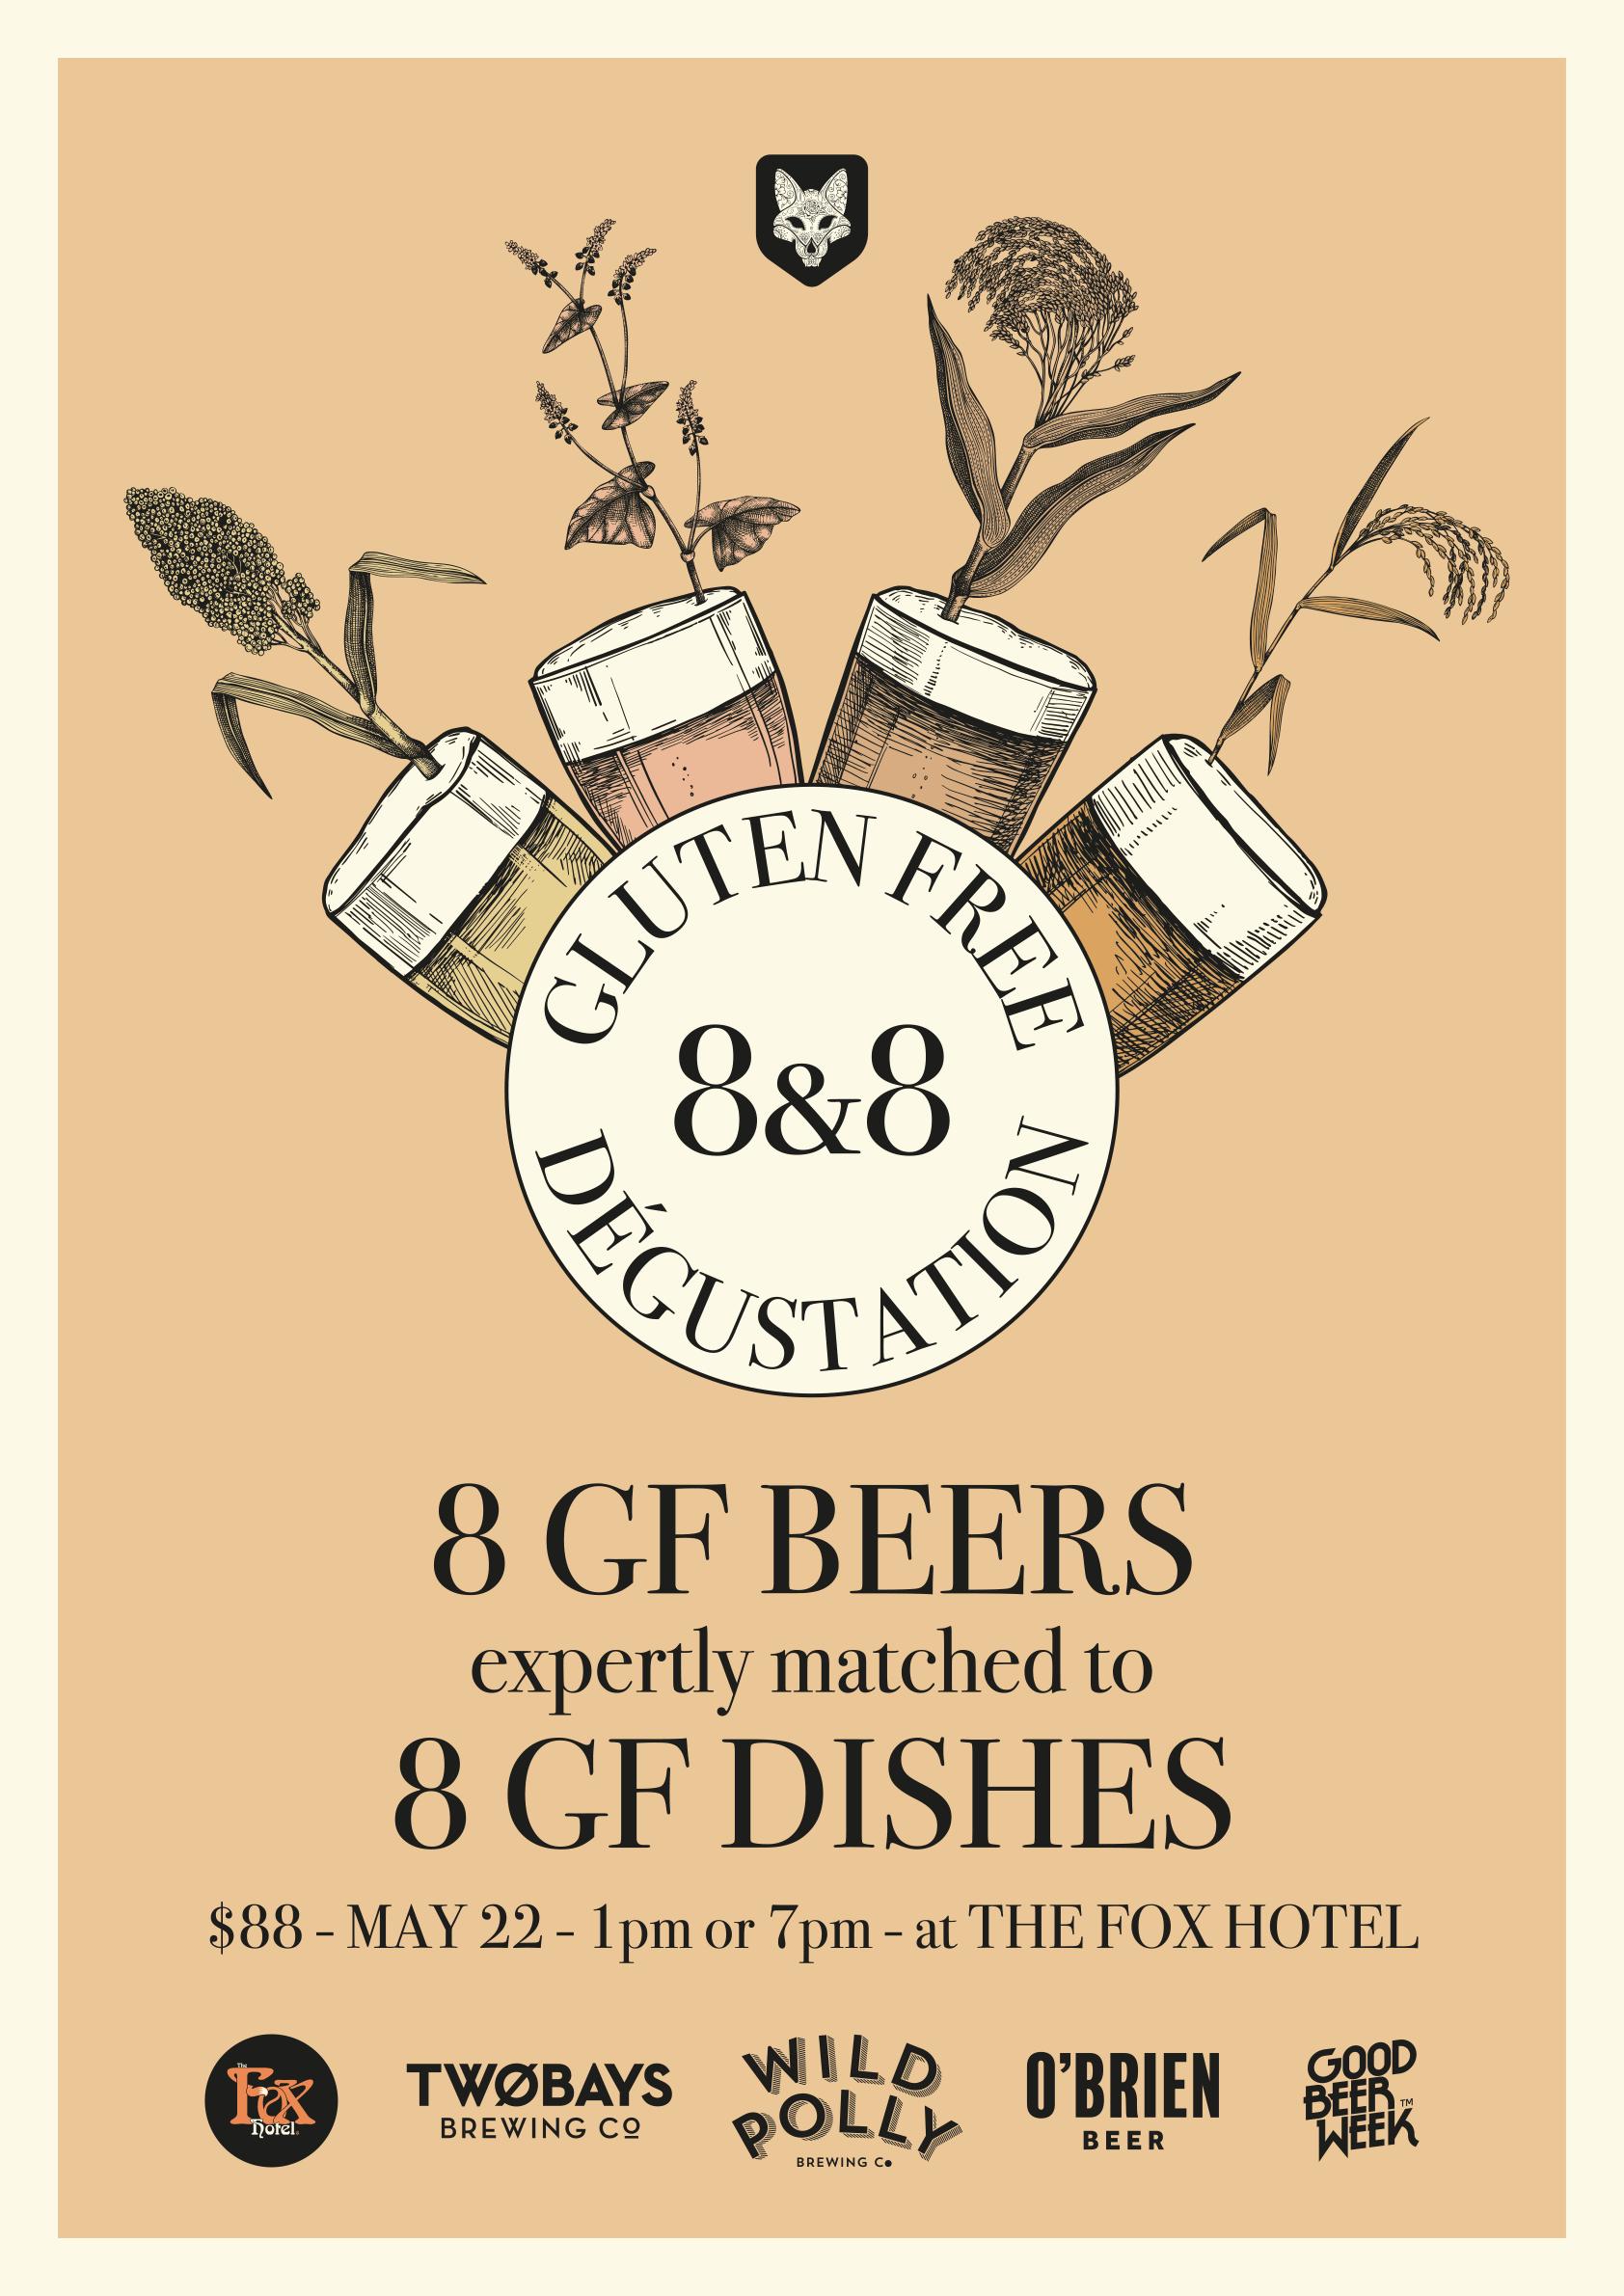 The Fox Hotel, Good Beer Week - Gluten Free Event